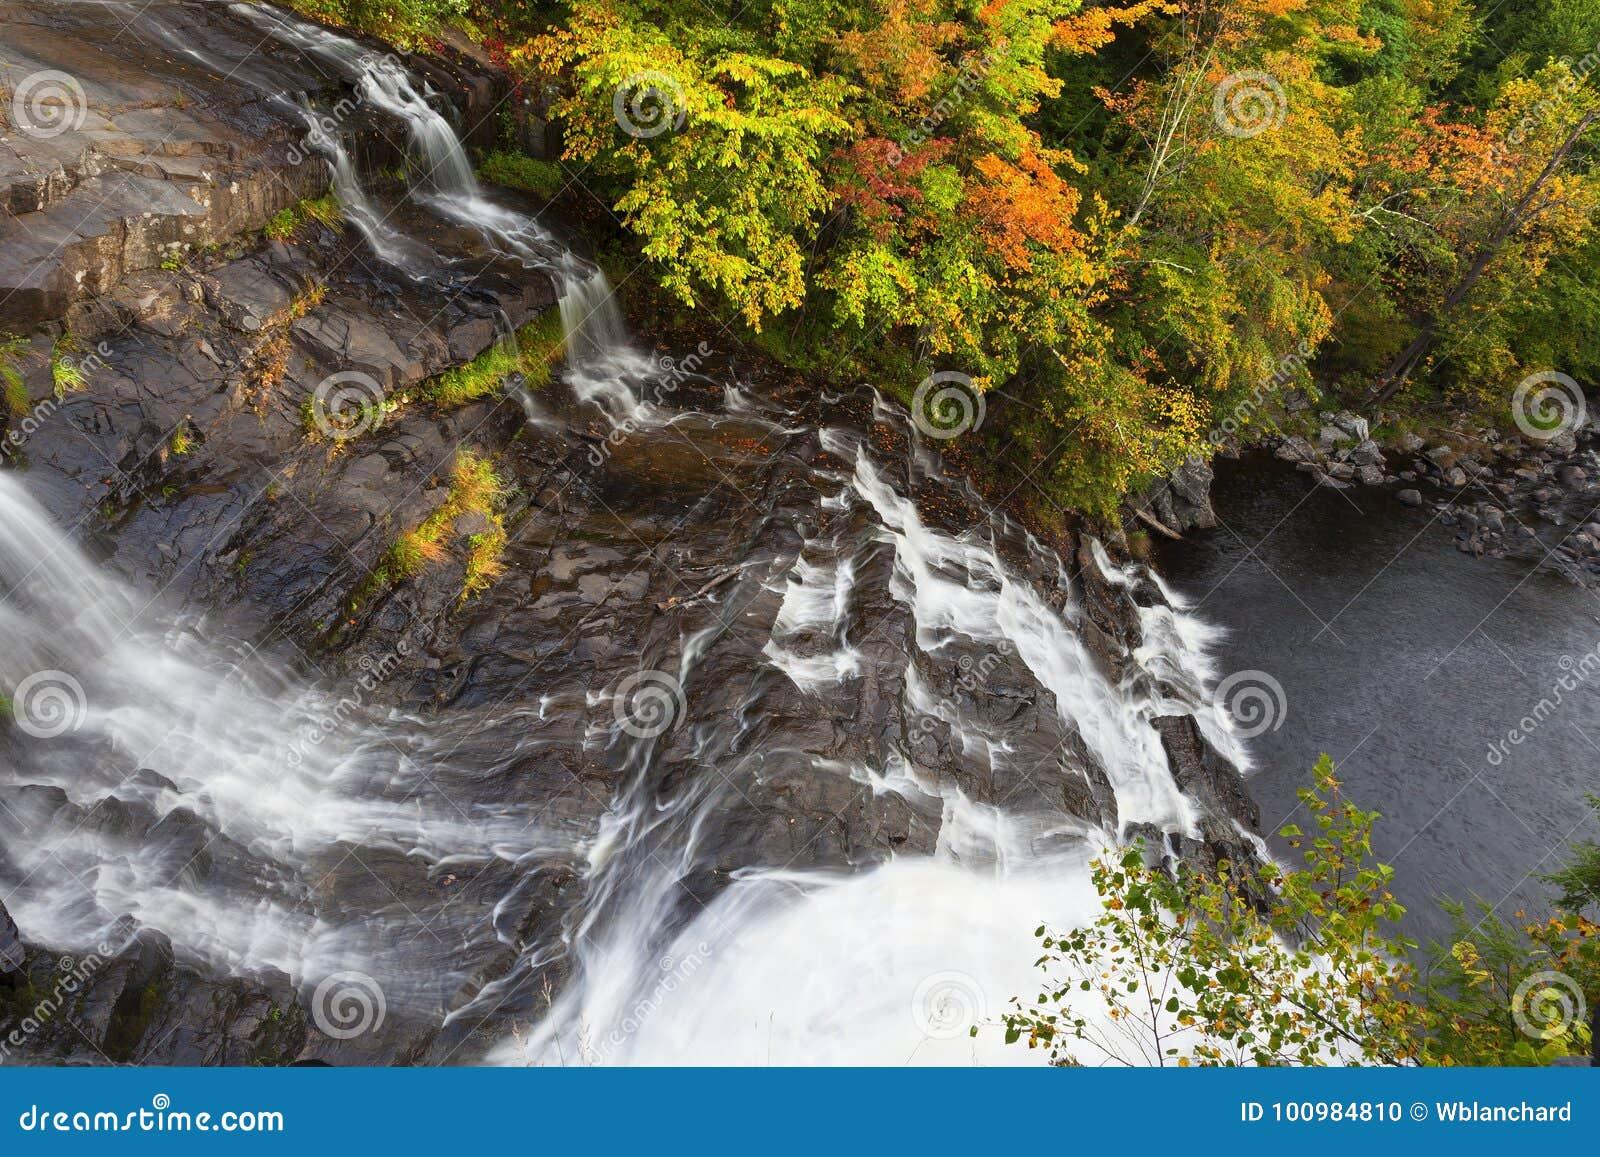 Autumn At Barberville Falls